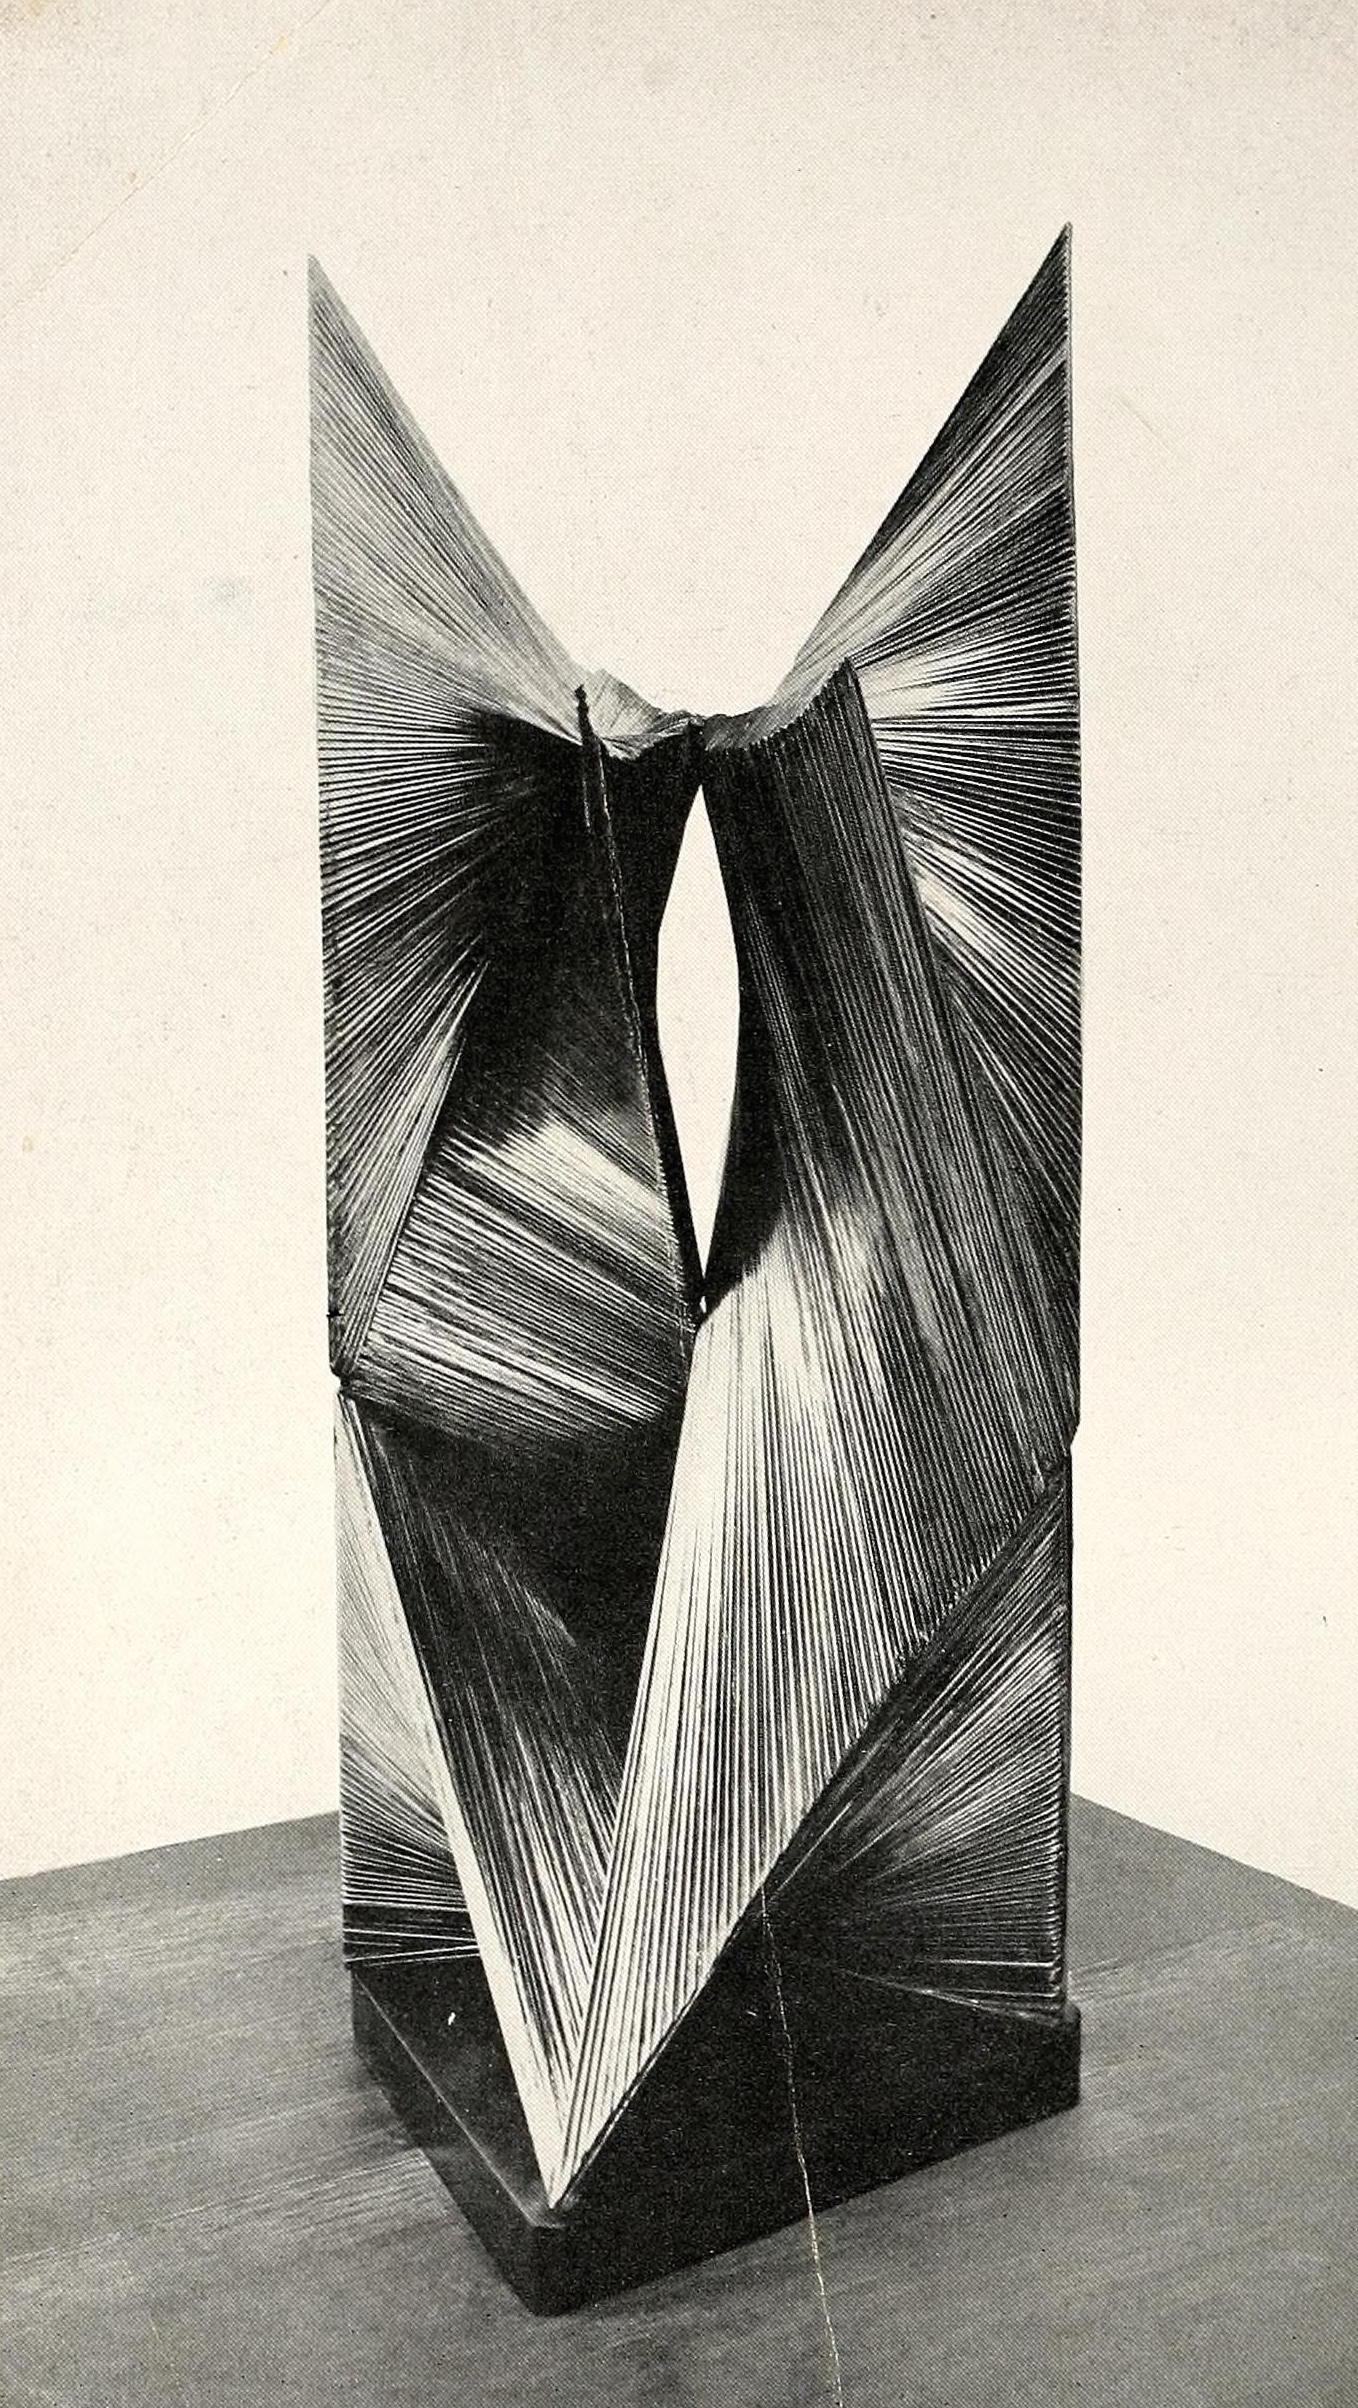 "Antoine Pevsner, developable surface (1938), Oxidized bronze on slate base, 25,5"" high1"